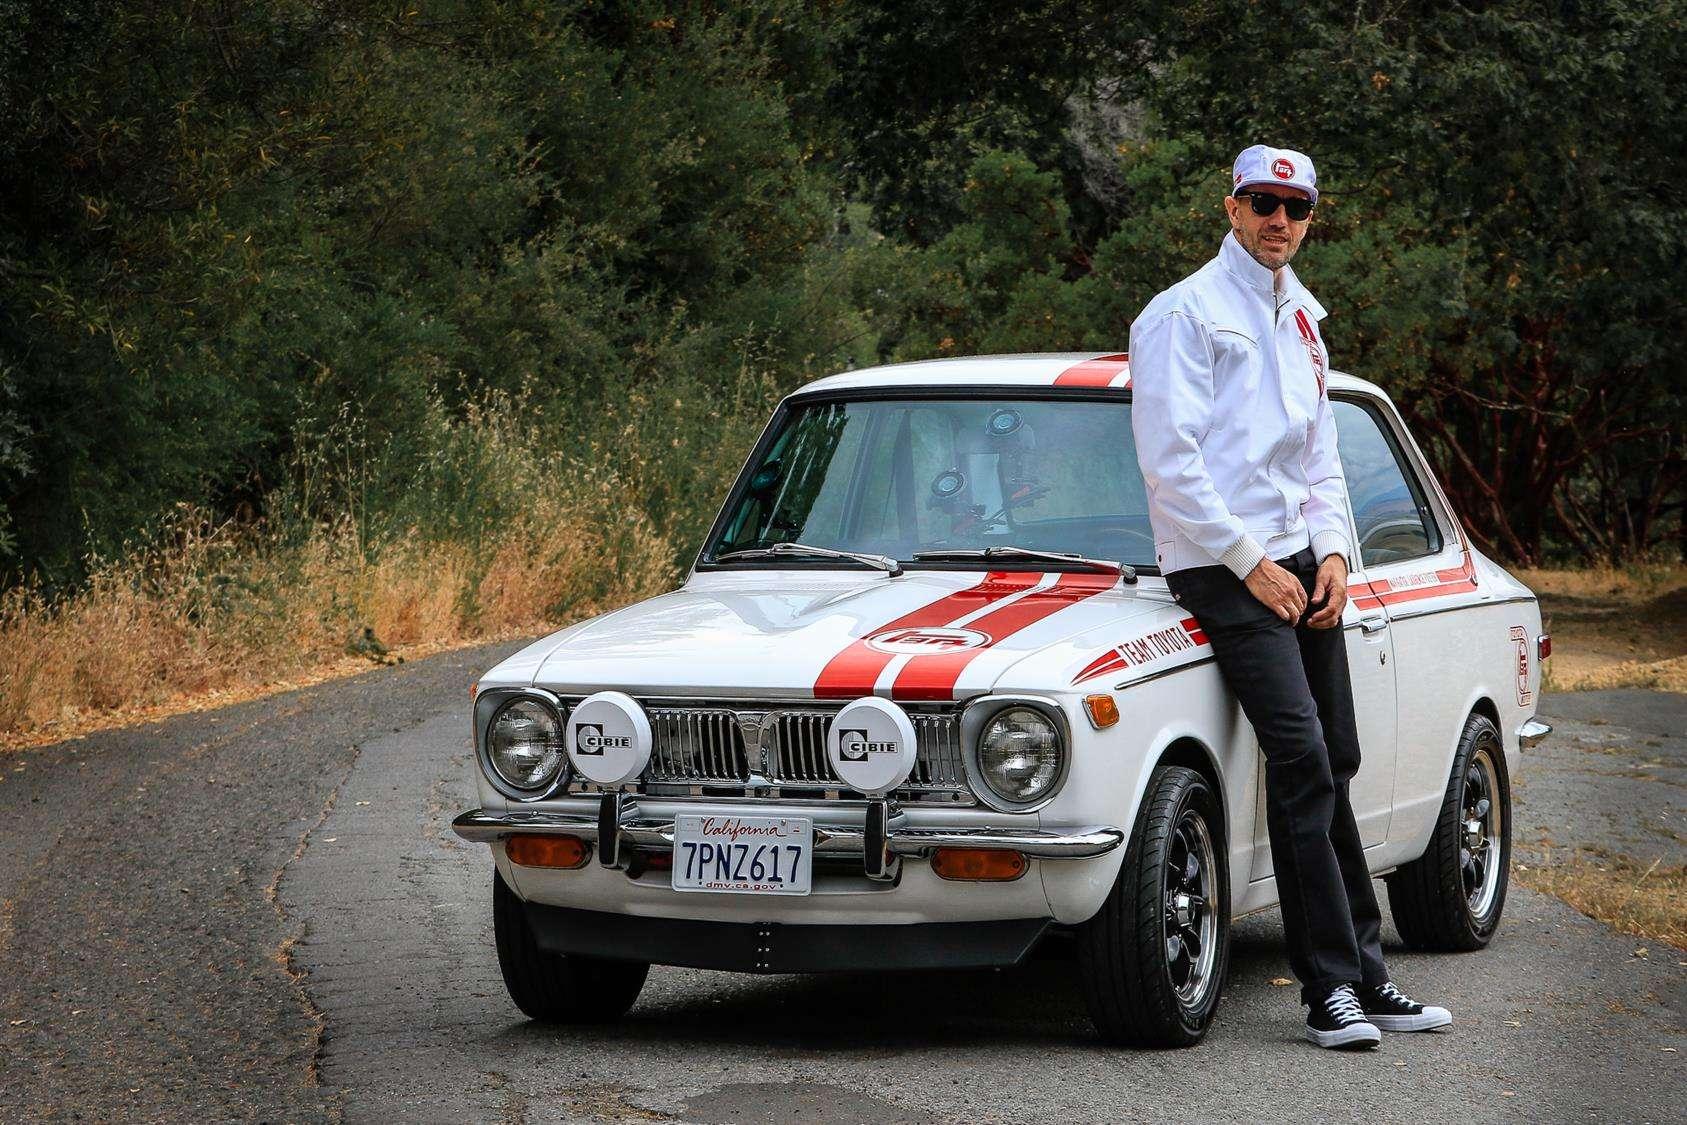 Toyota Corolla Generasi Pertama Meriahkan Vintage Endurance Competition